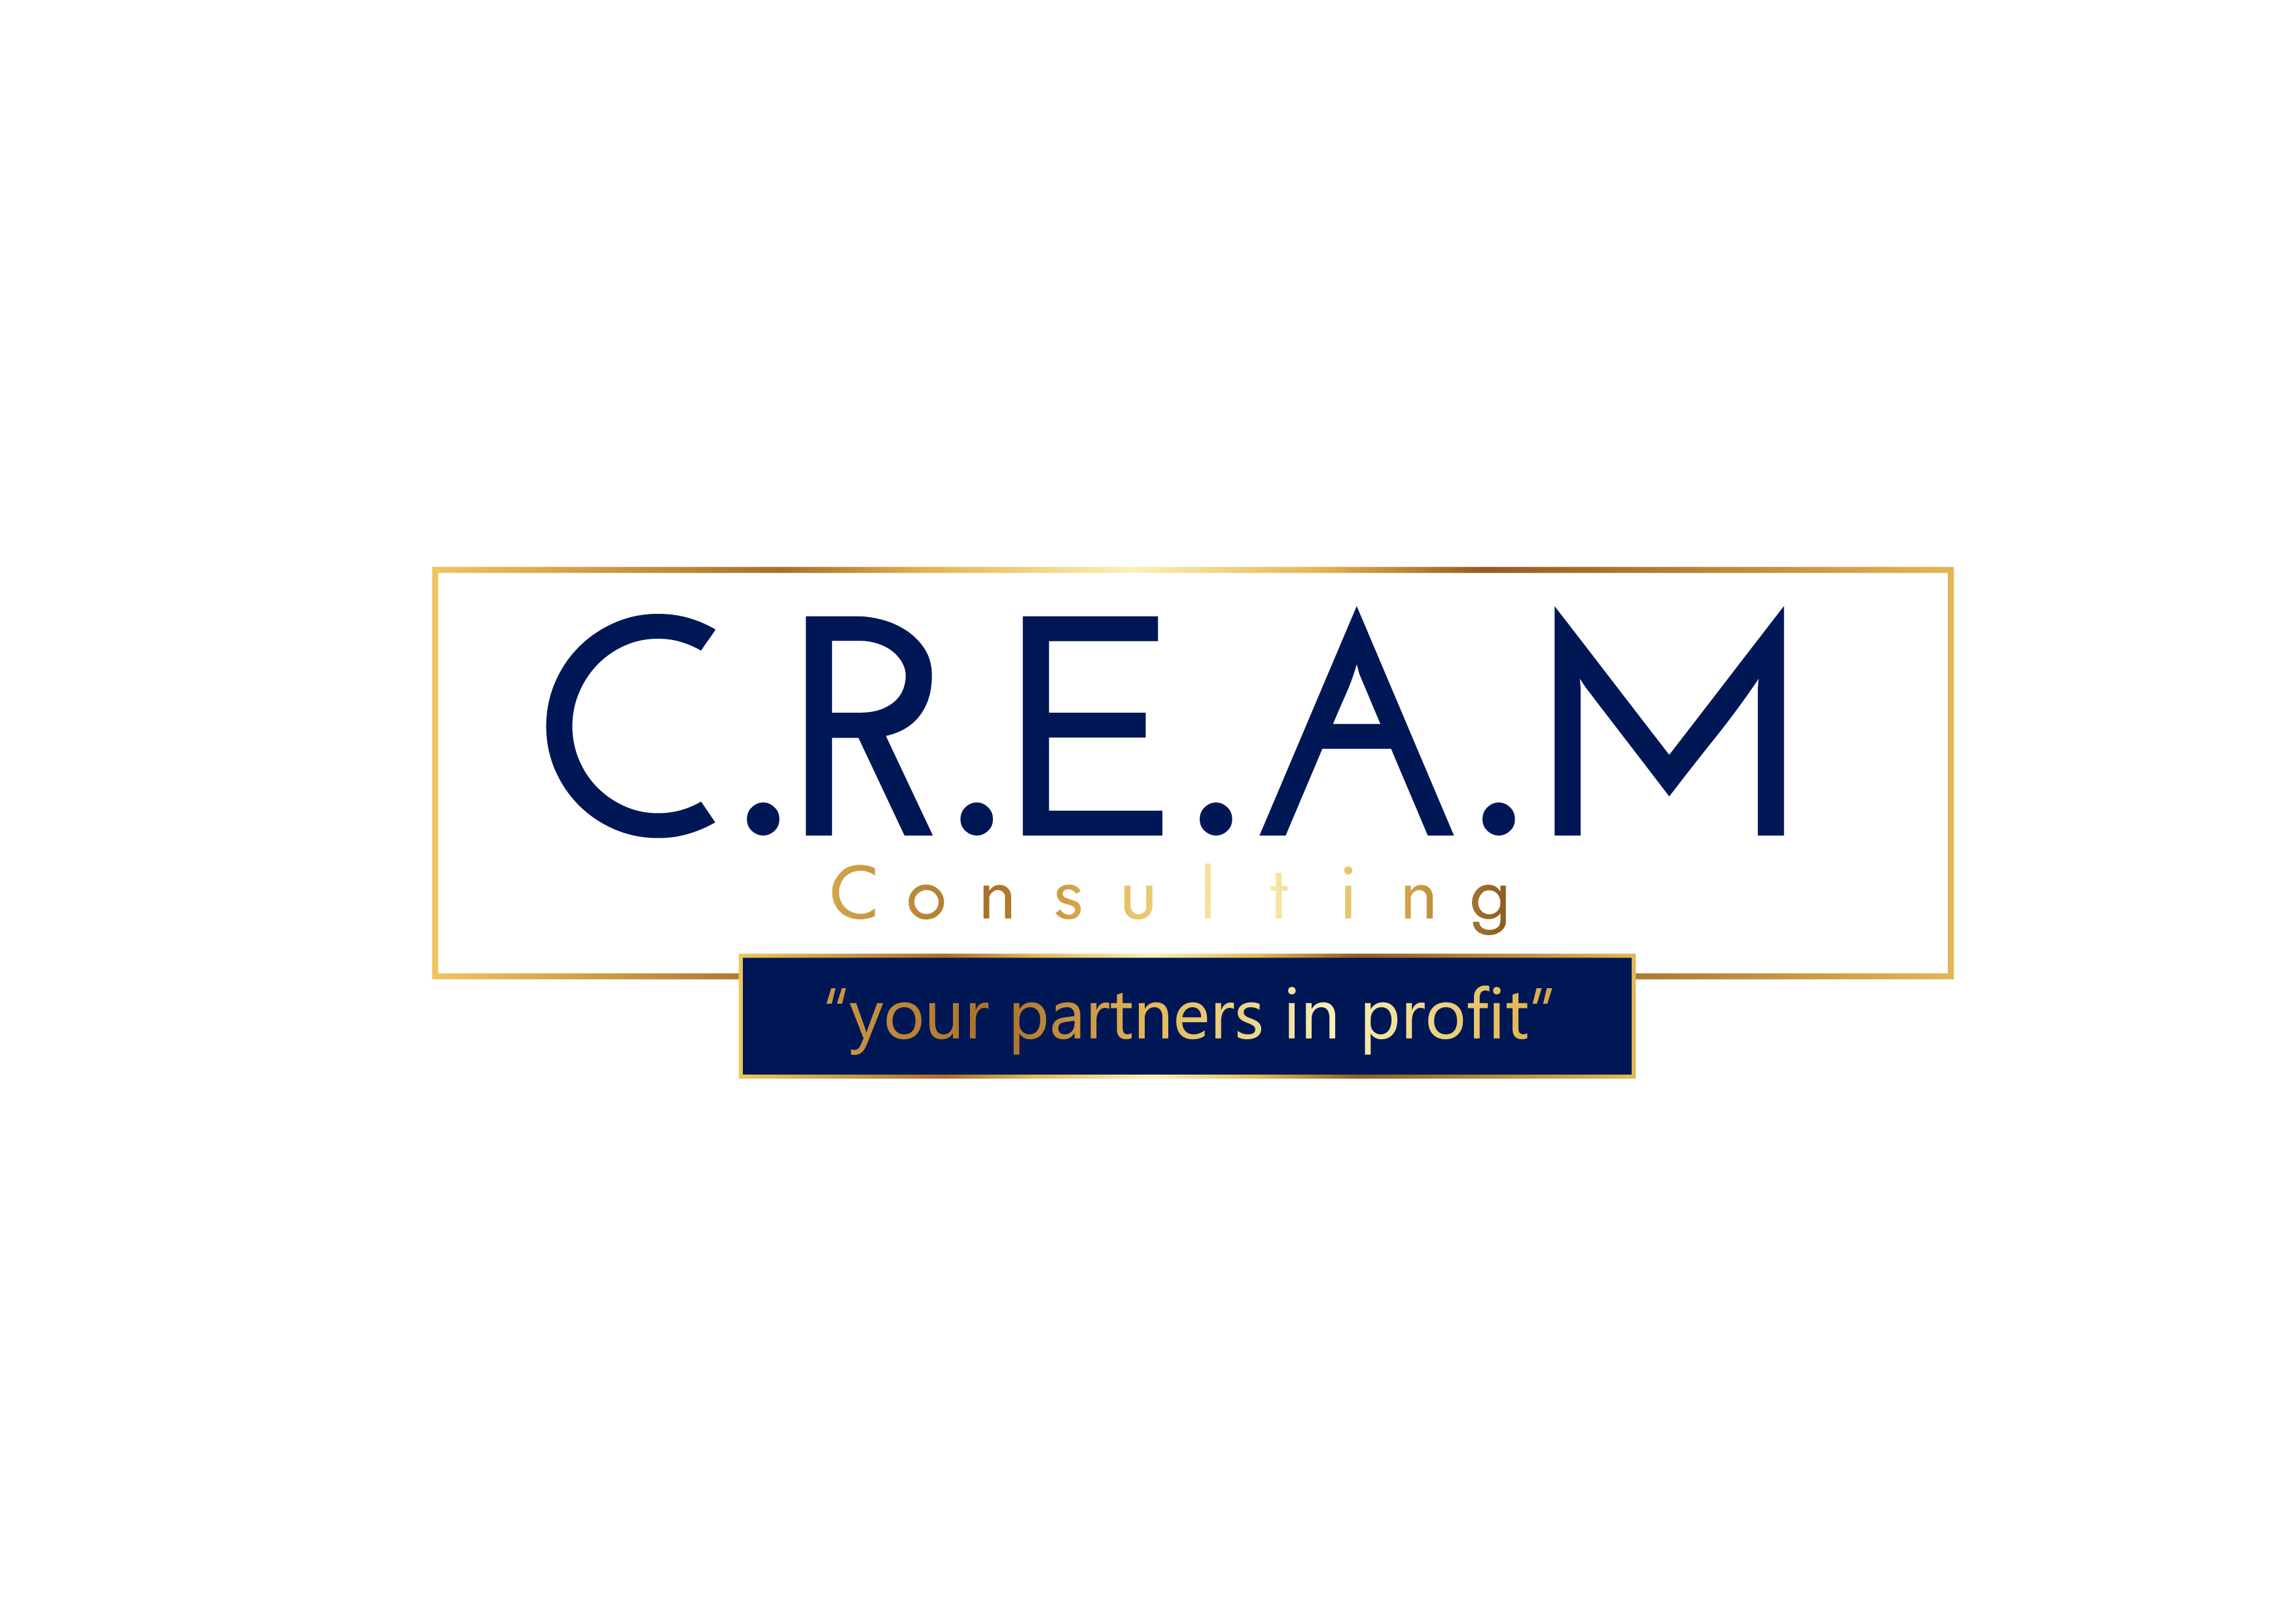 C.R.E.A.M Consulting LLC